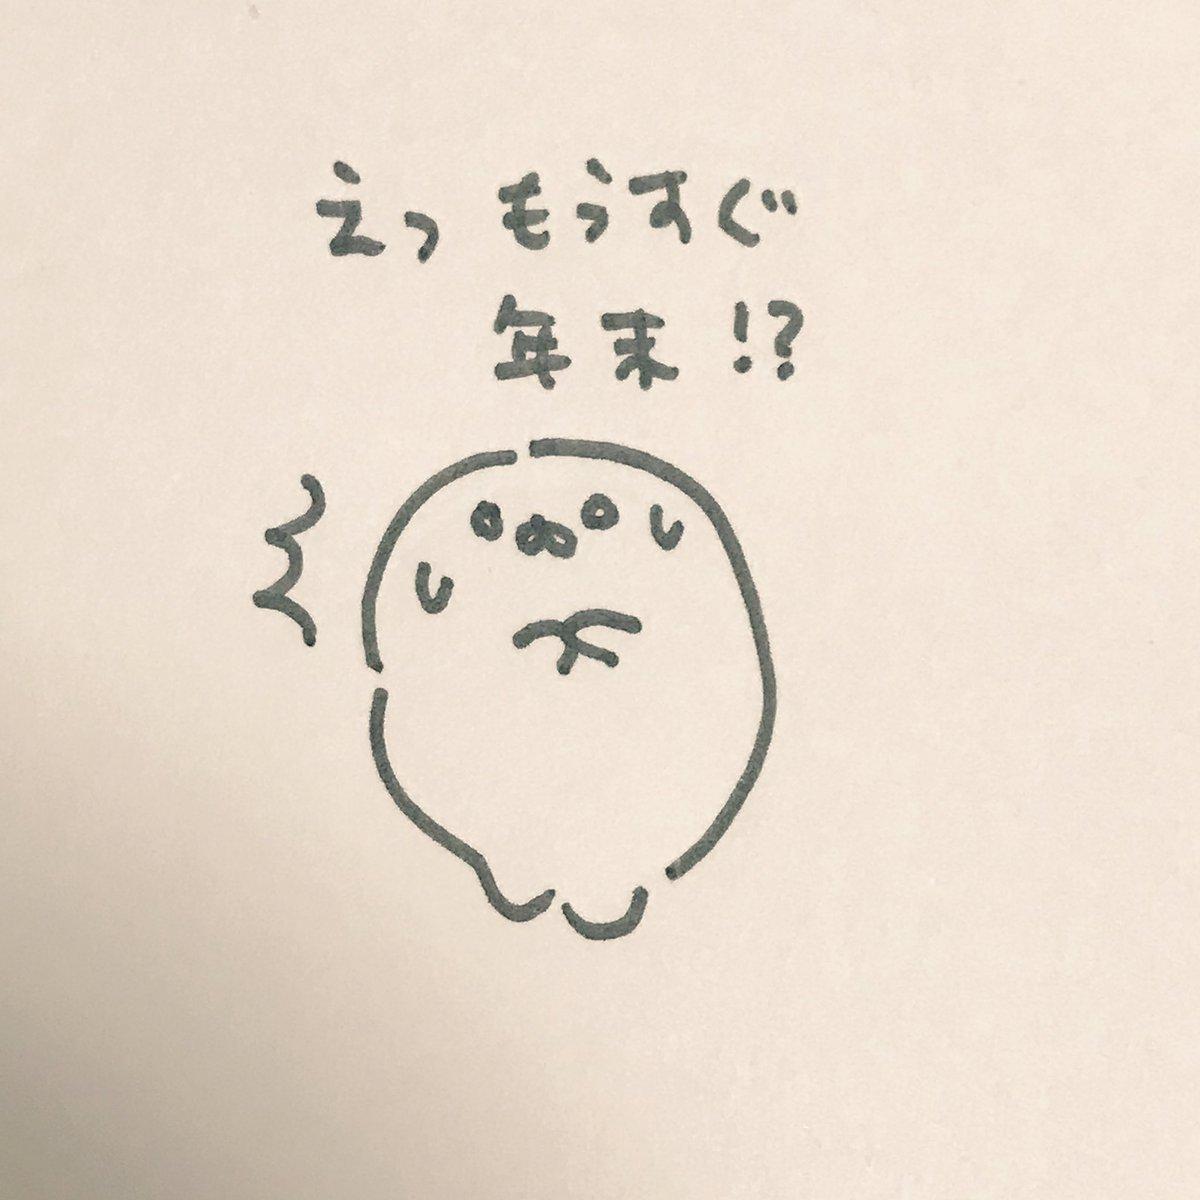 RT @ushihito: 最近よくなる https://t.co/5DsRrkULHl